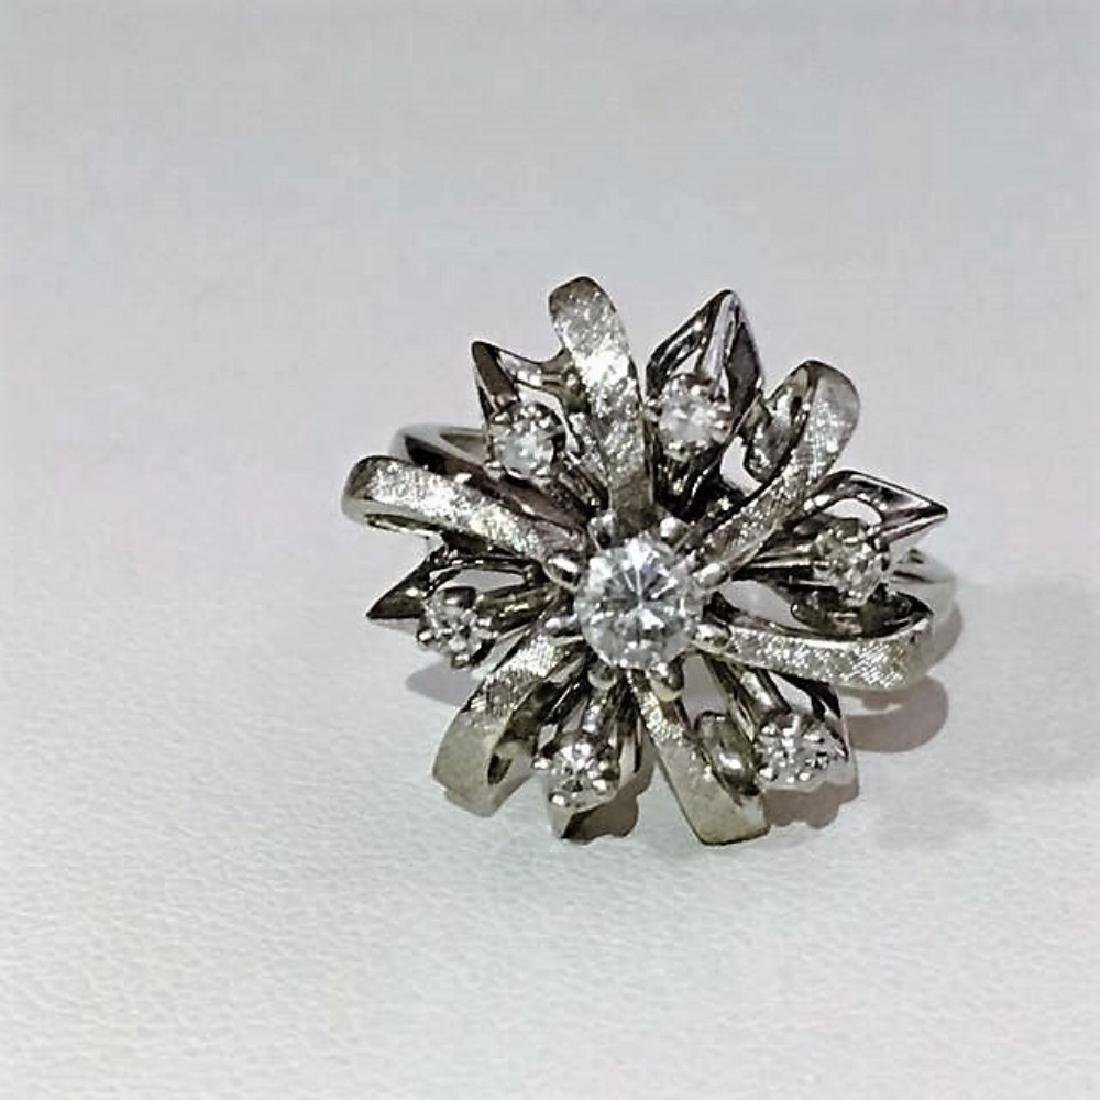 14K White Gold Cocktail Diamond Ring